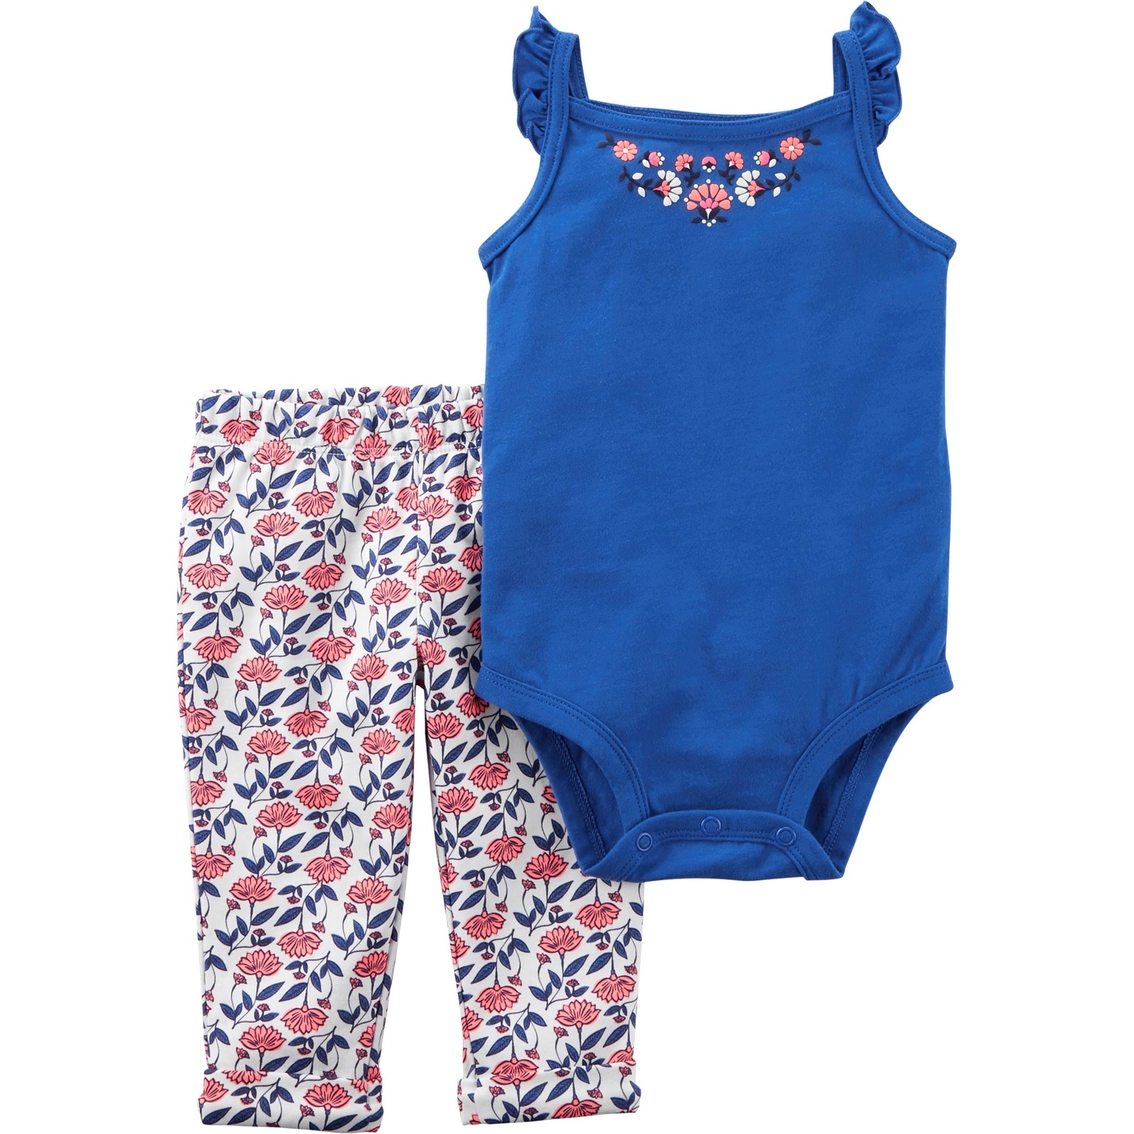 8c54094beecb Carter s Infant Girls 2 Pc. Floral Bodysuit And Pants Set